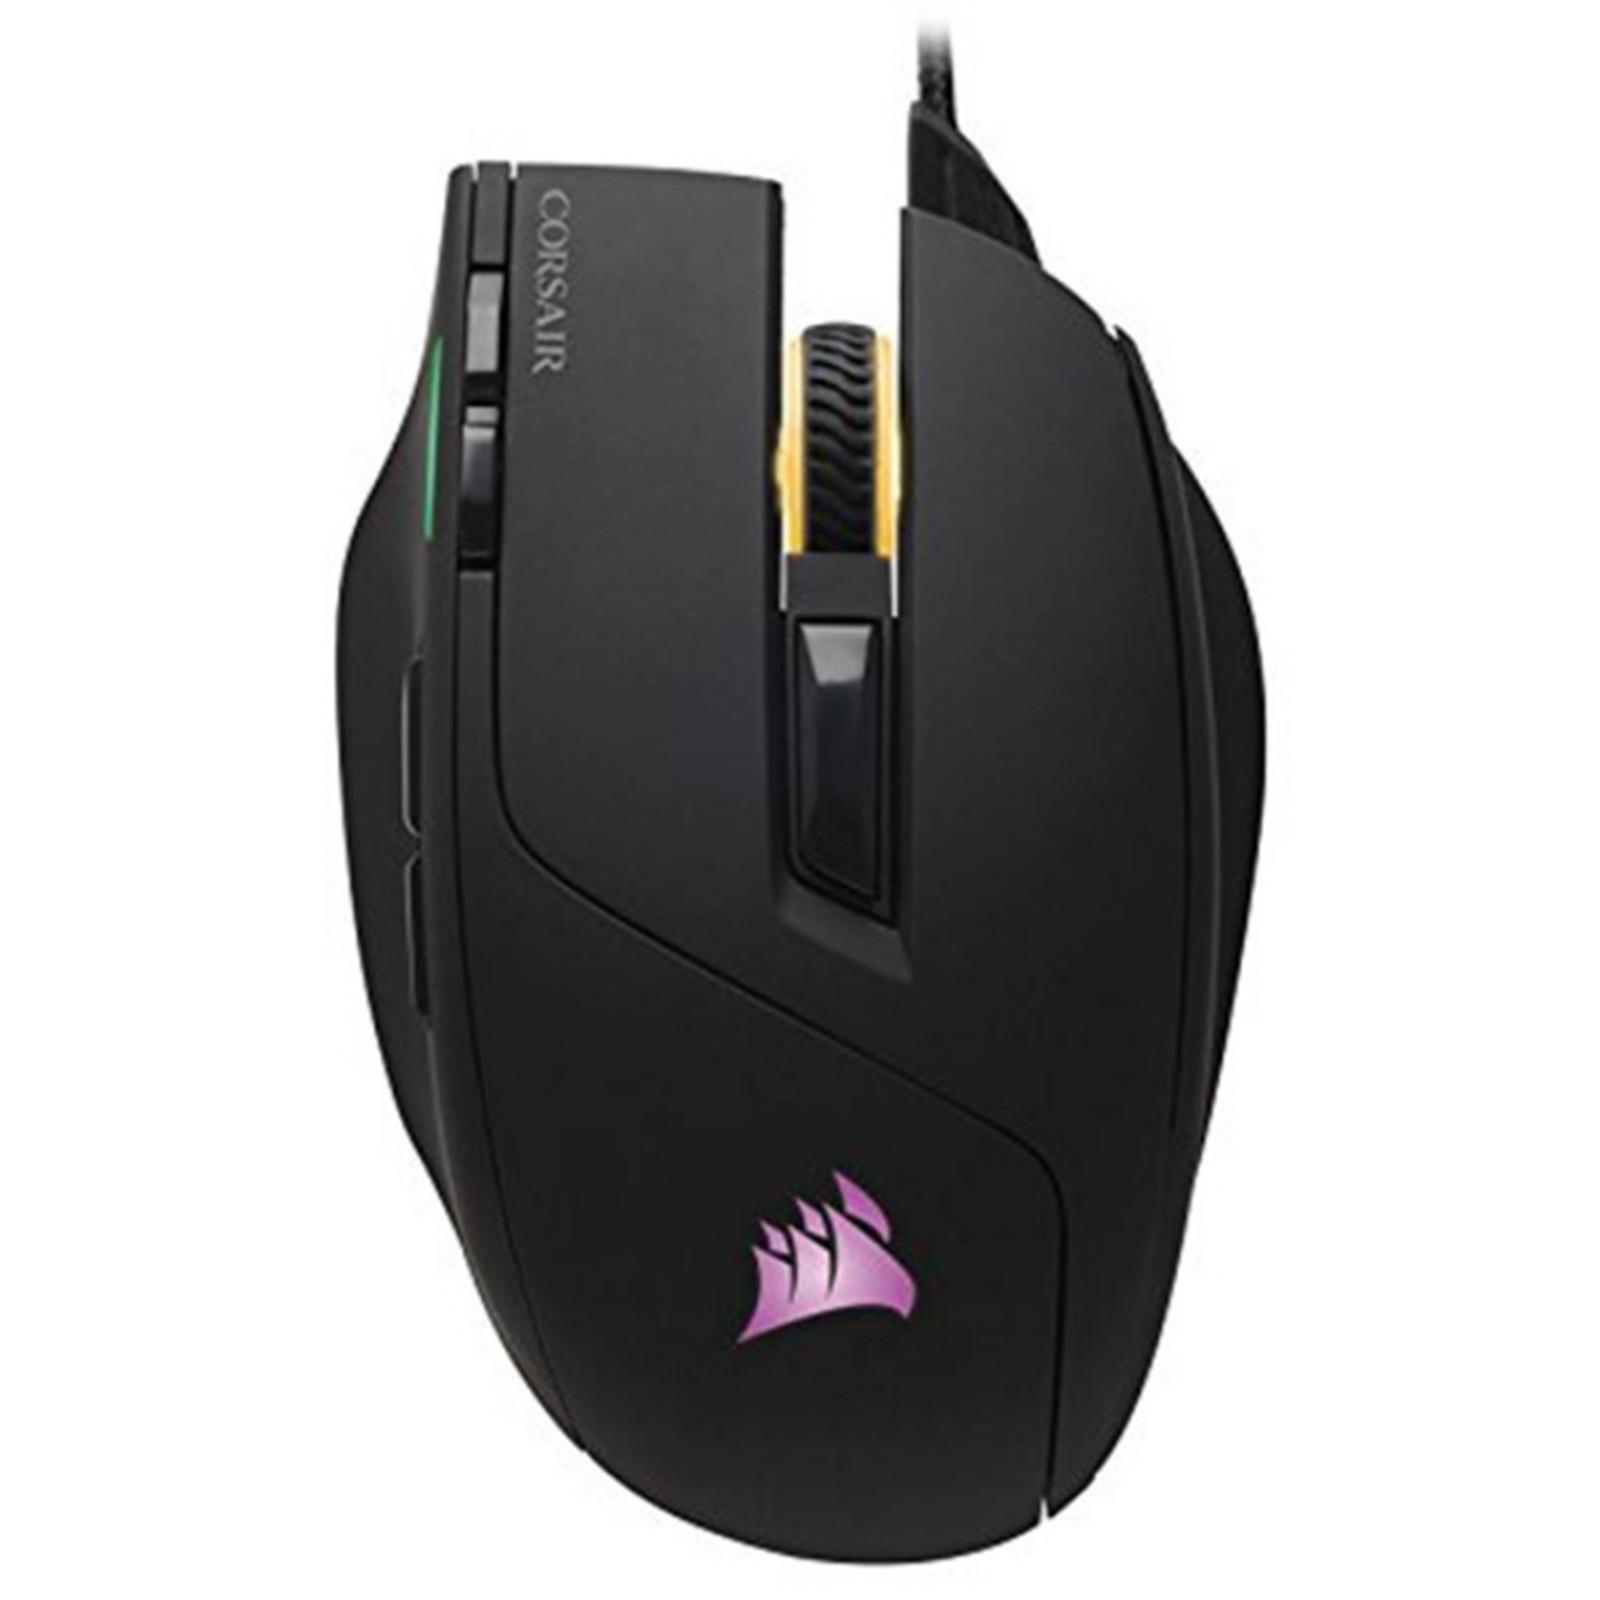 Buy the Corsair Sabre Optical RGB Gaming Mouse - 10000 DPI